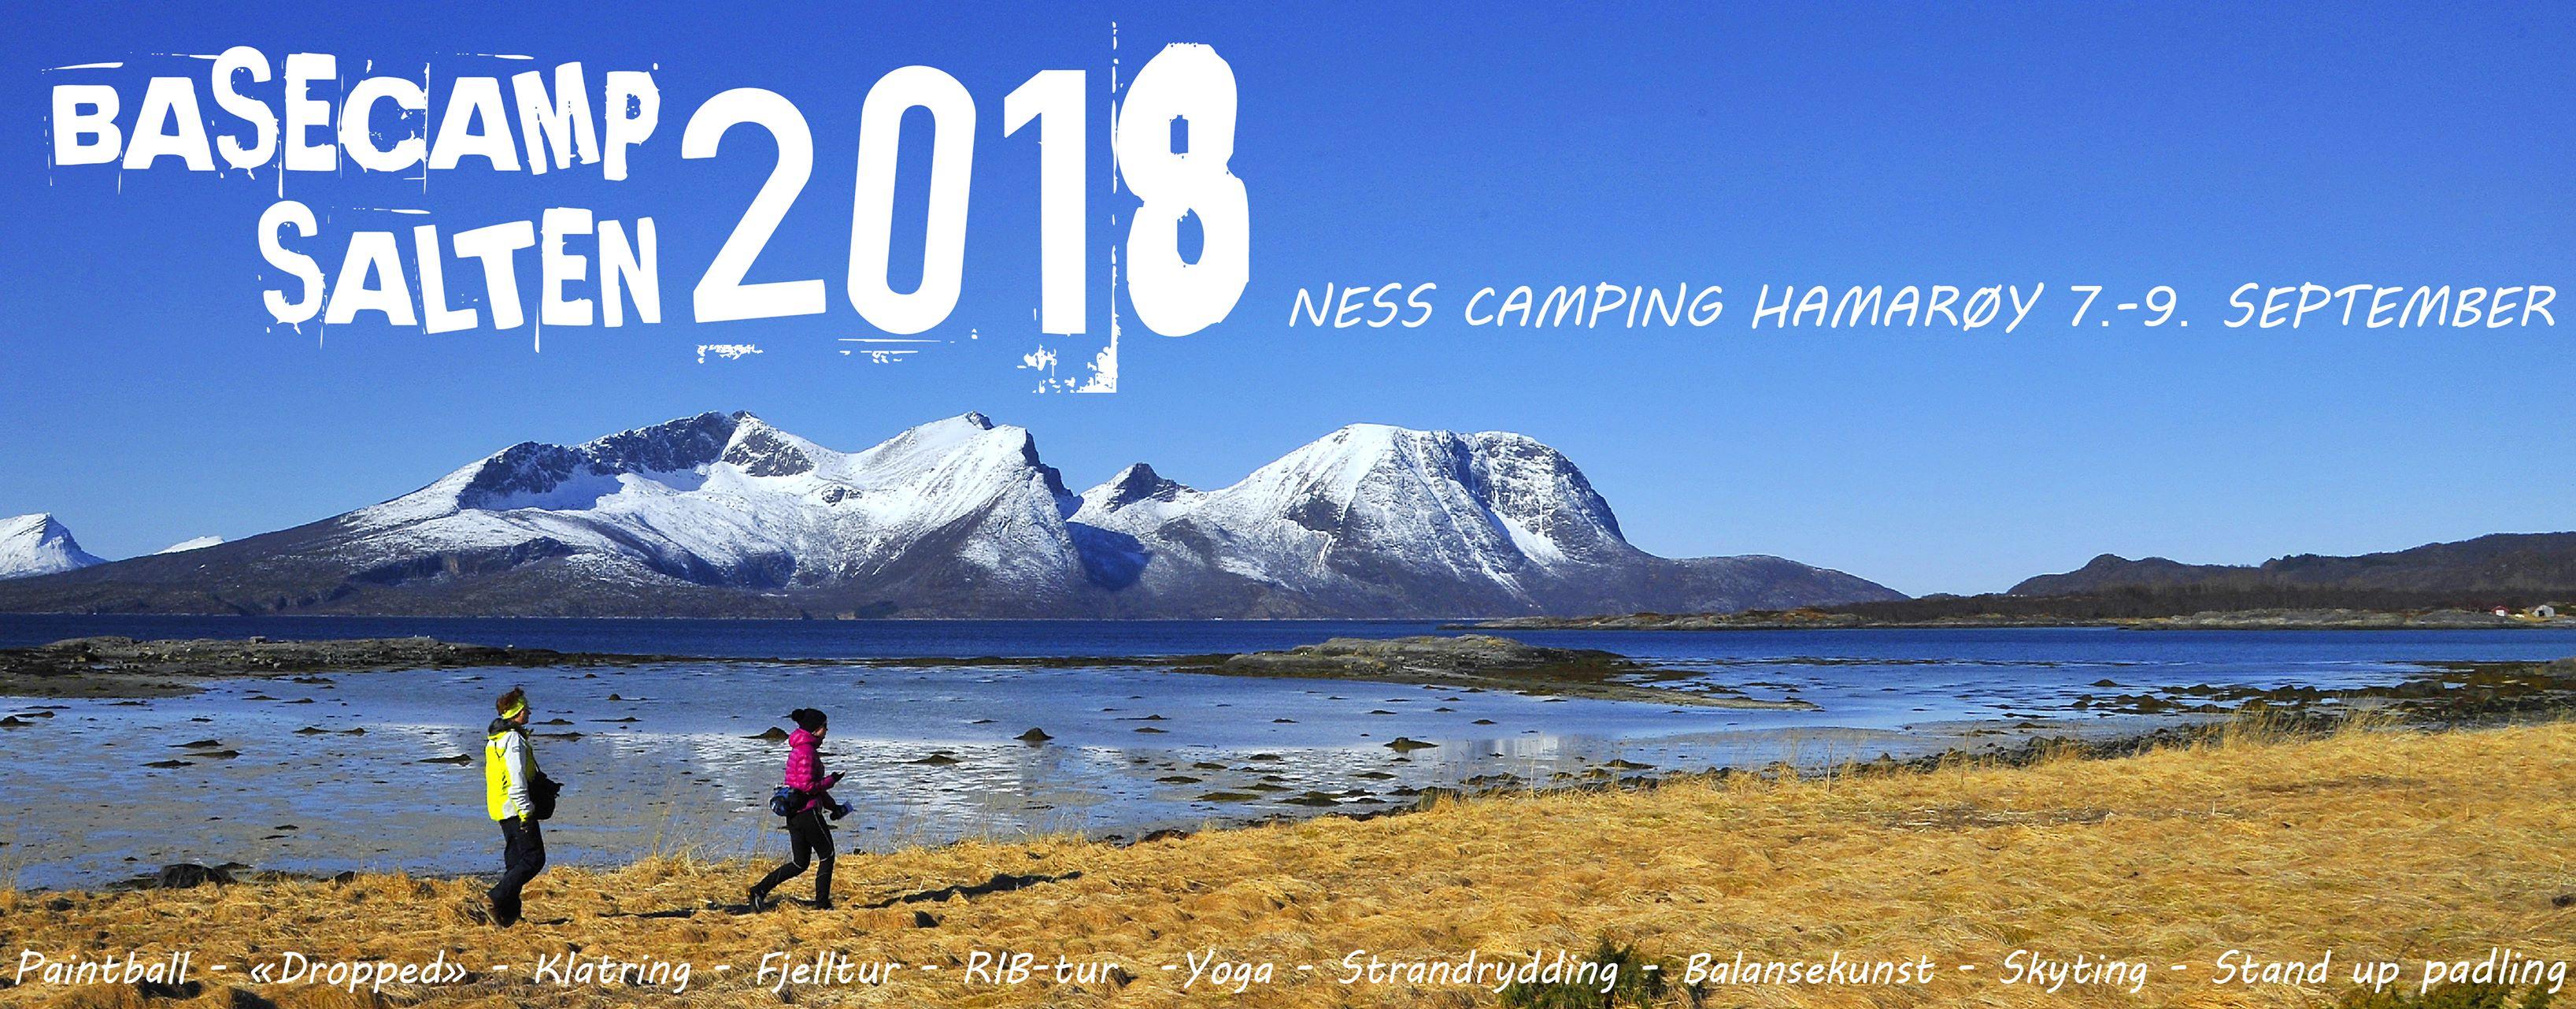 Basecamp Salten 2018